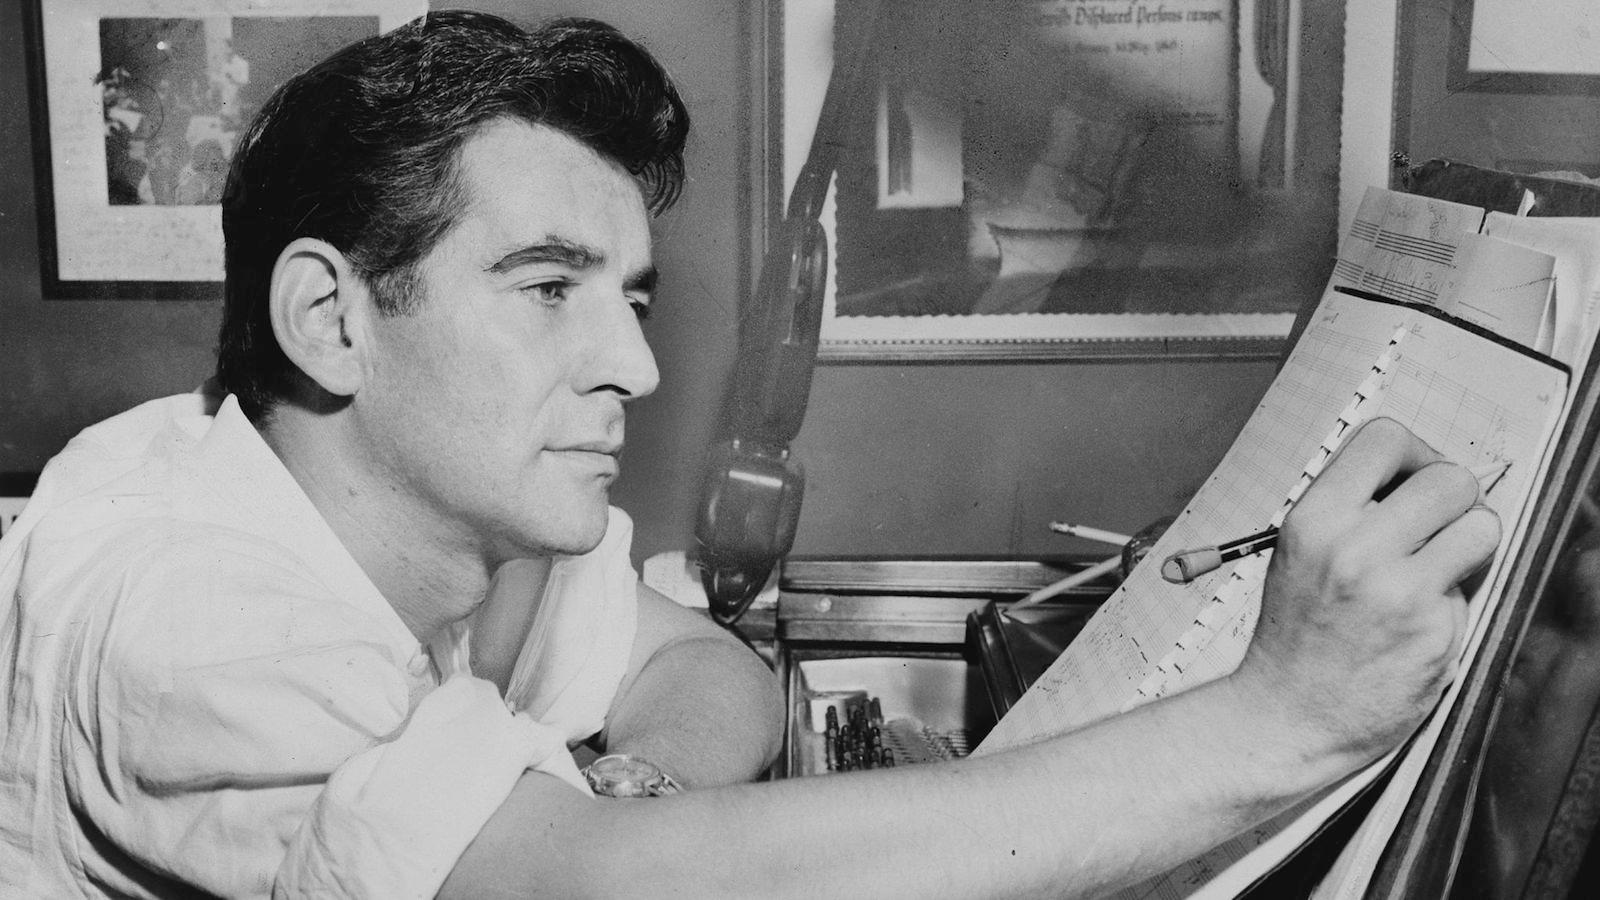 Leonard Bernstein: Jewish America's Favorite (Musical) Son | My Jewish Learning